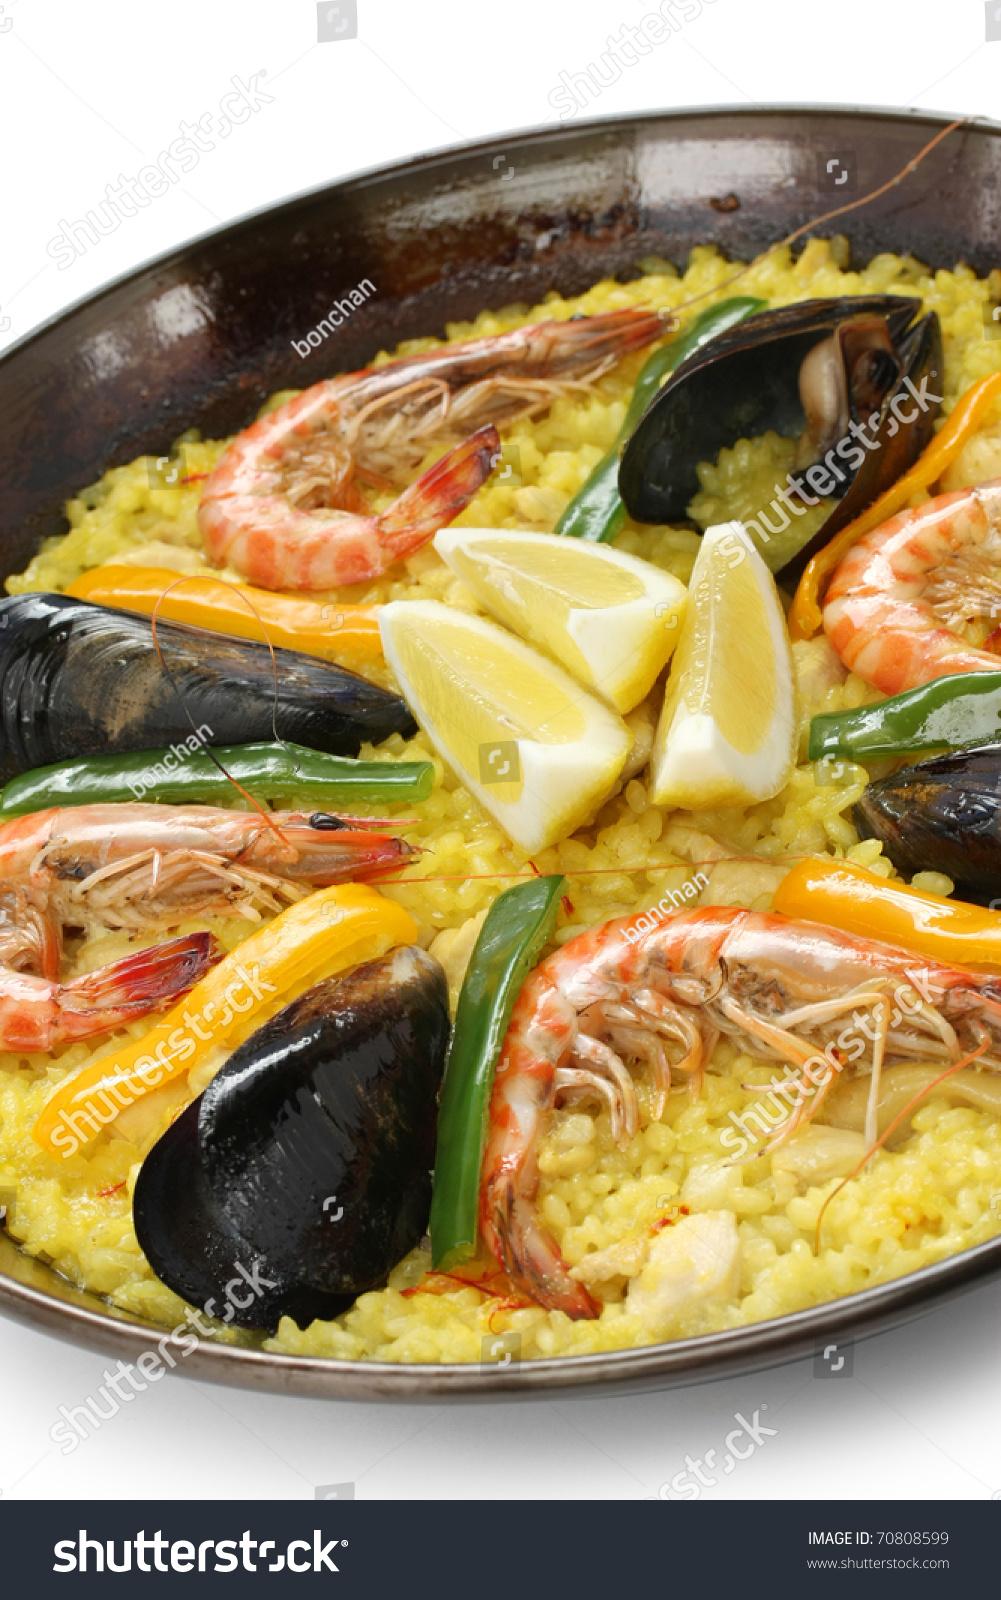 how to prepare paella rice